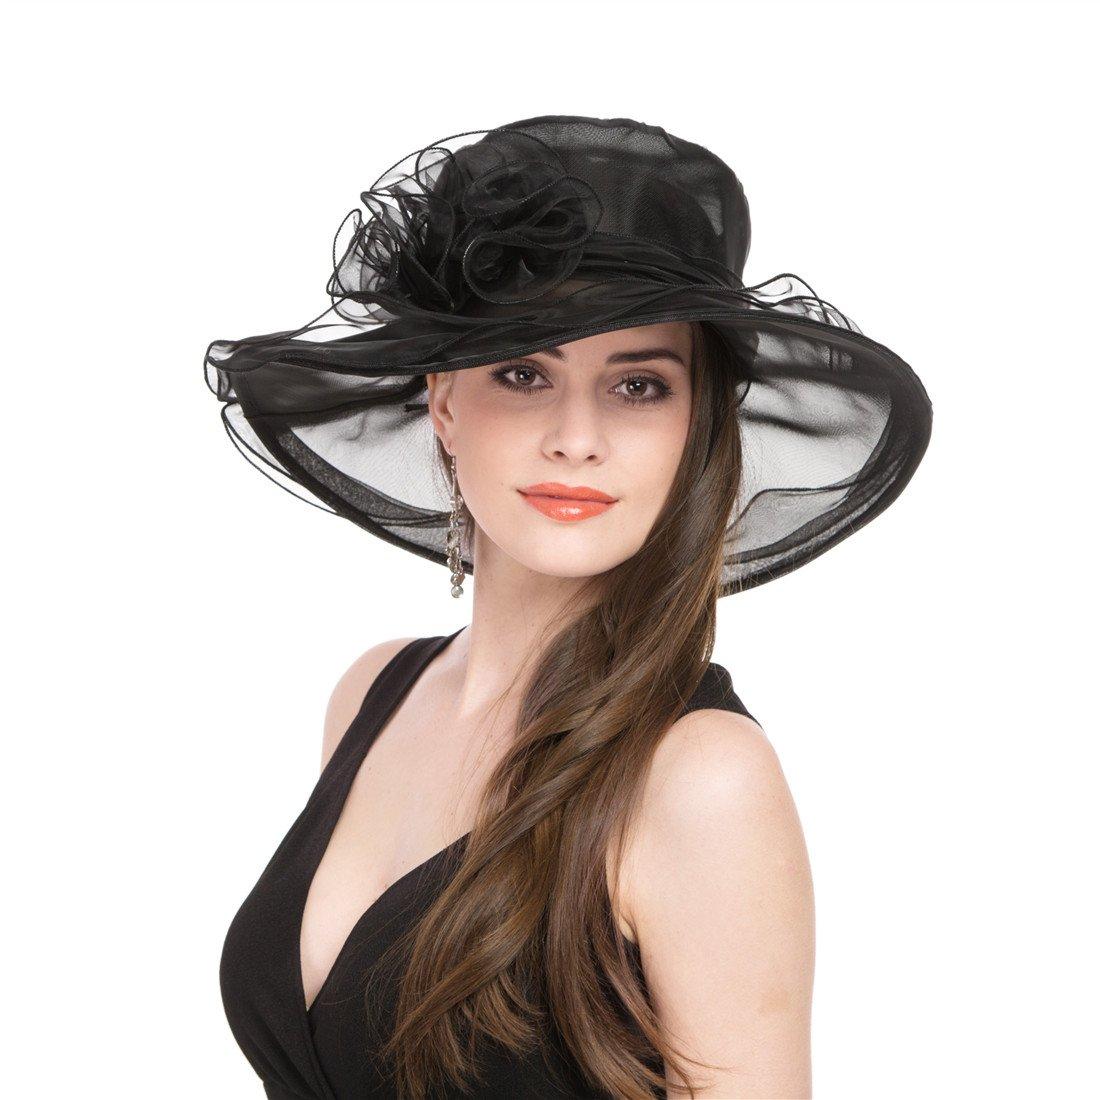 07ac013a737 SAFERIN Women s Organza Church Kentucky Derby Fascinator Bridal Tea Party  Wedding Hat (1-Black) at Amazon Women s Clothing store